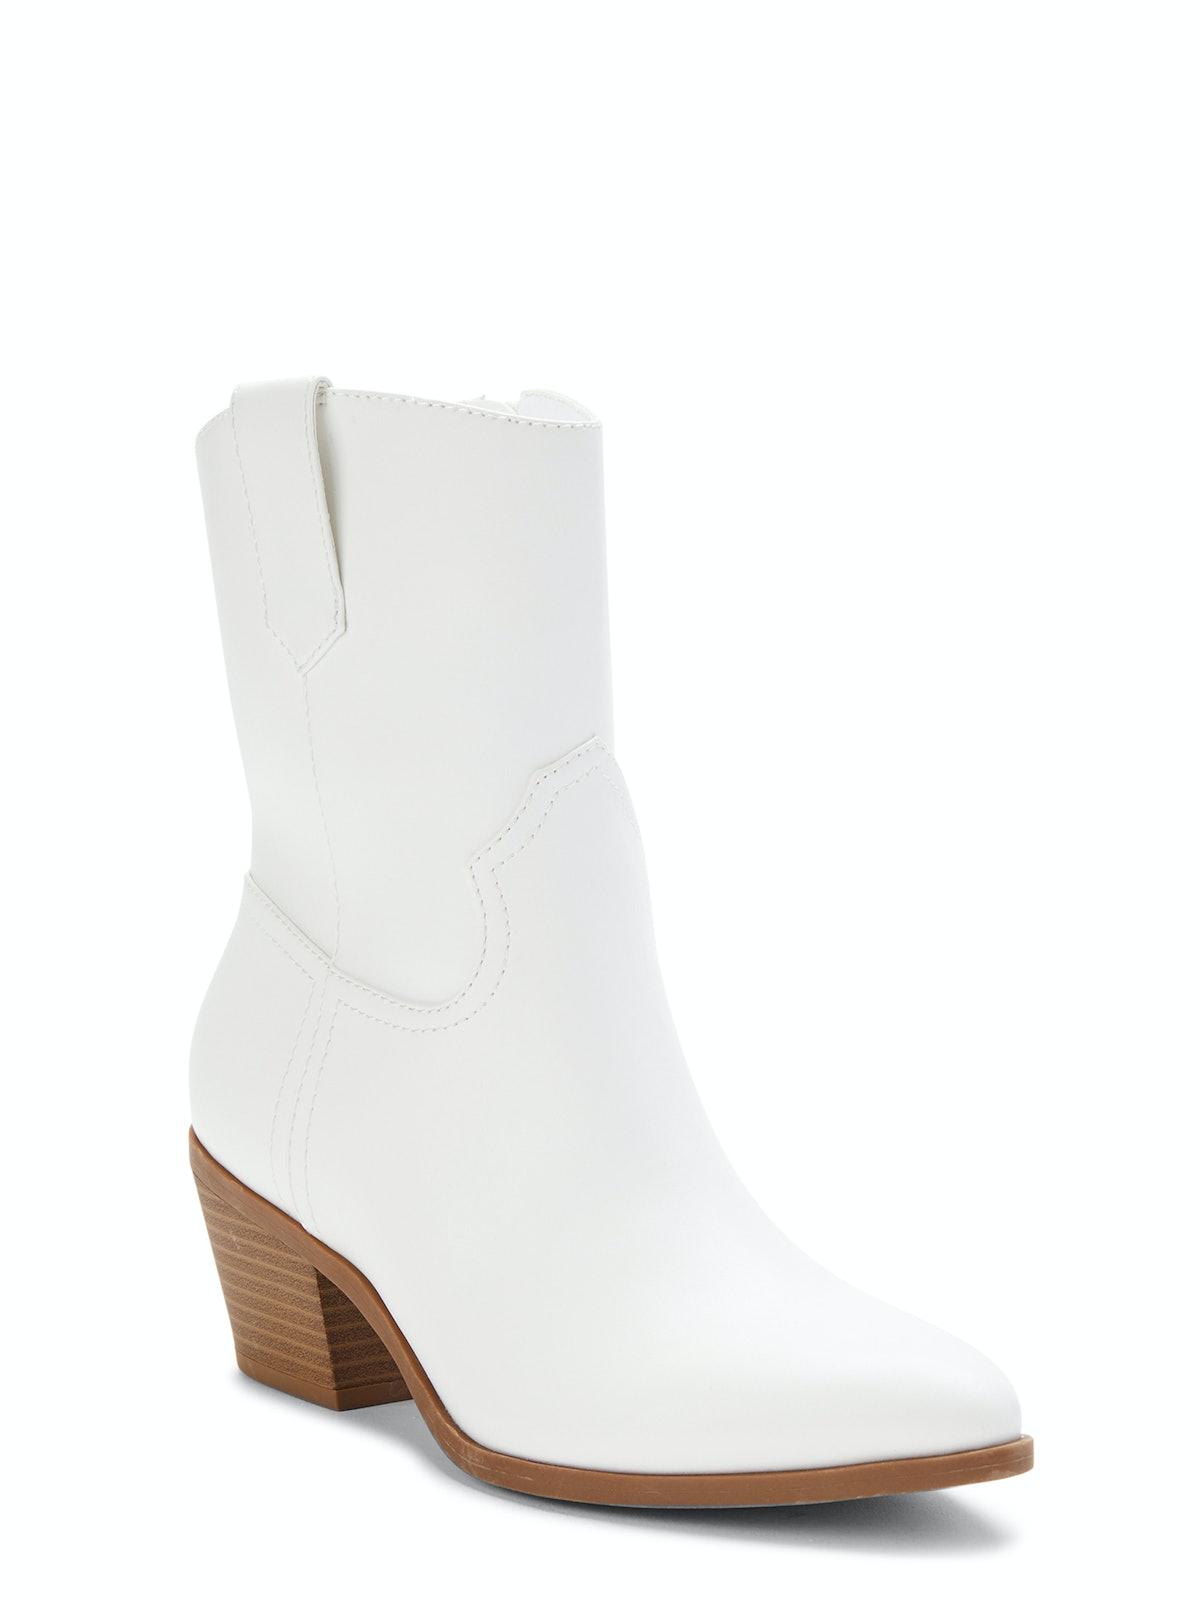 Avery Western Boot